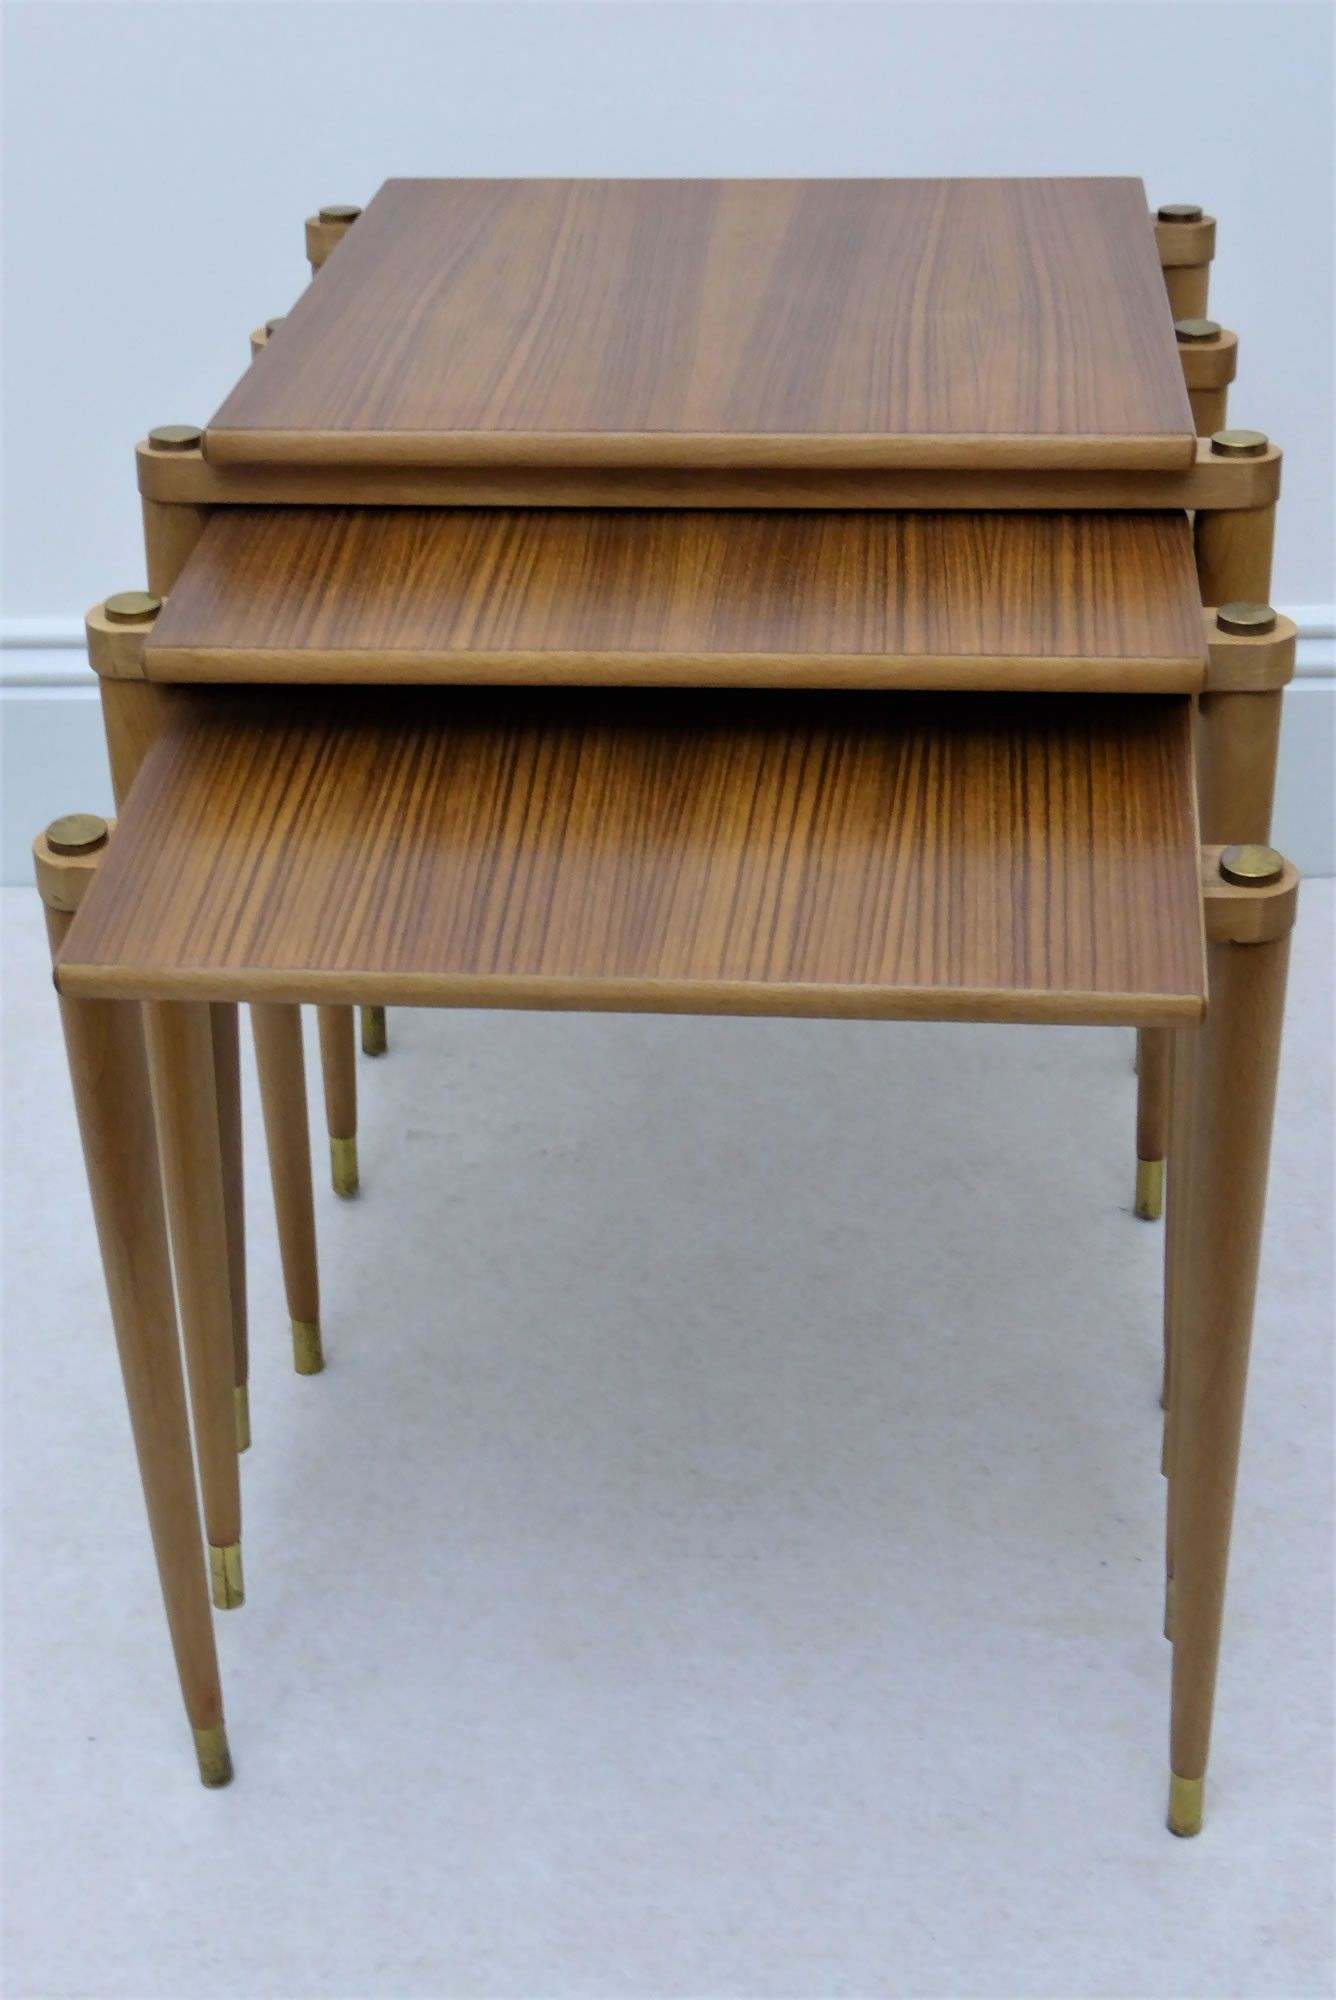 A B S Ljungqvist Nesting Tables In Teak 1960s Bijzettafels